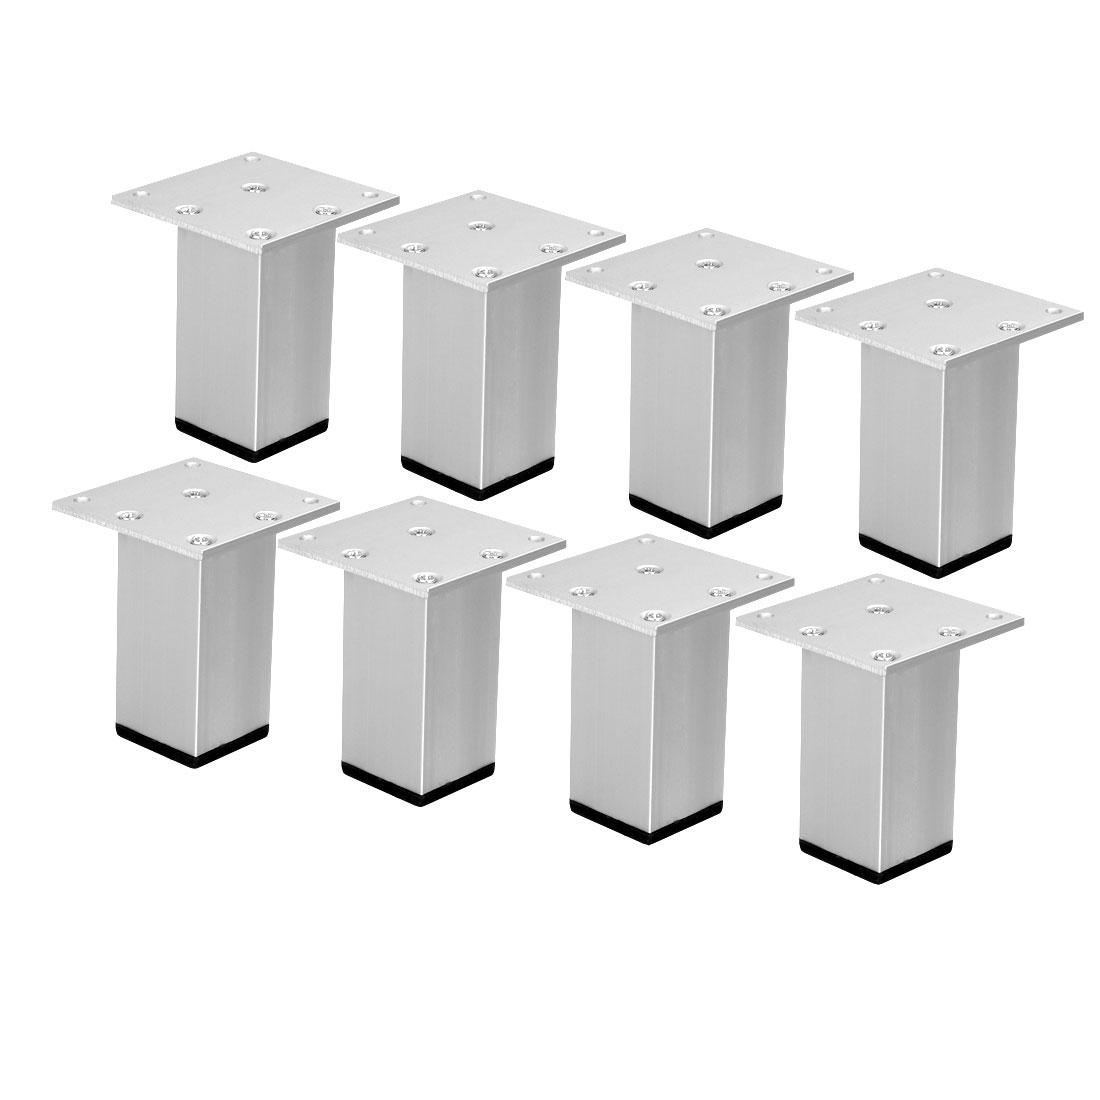 "3"" Furniture Legs Aluminium Alloy Table Feet Replacement Height Adjuster 8pcs"